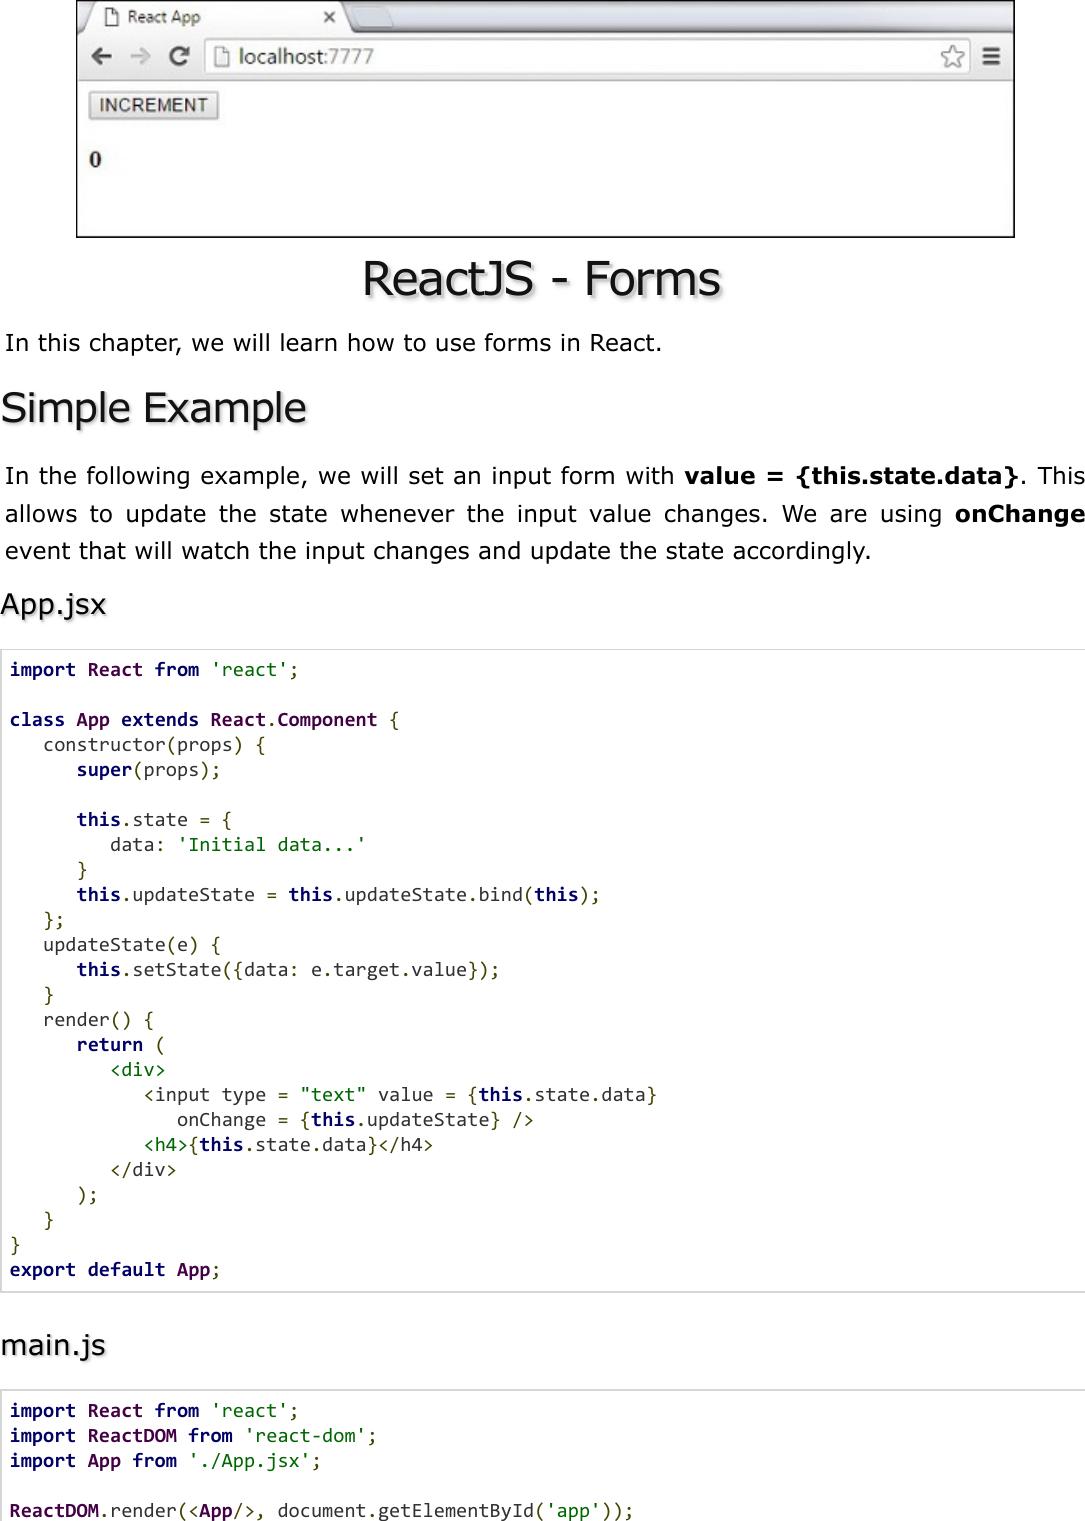 React JS Quick Guide